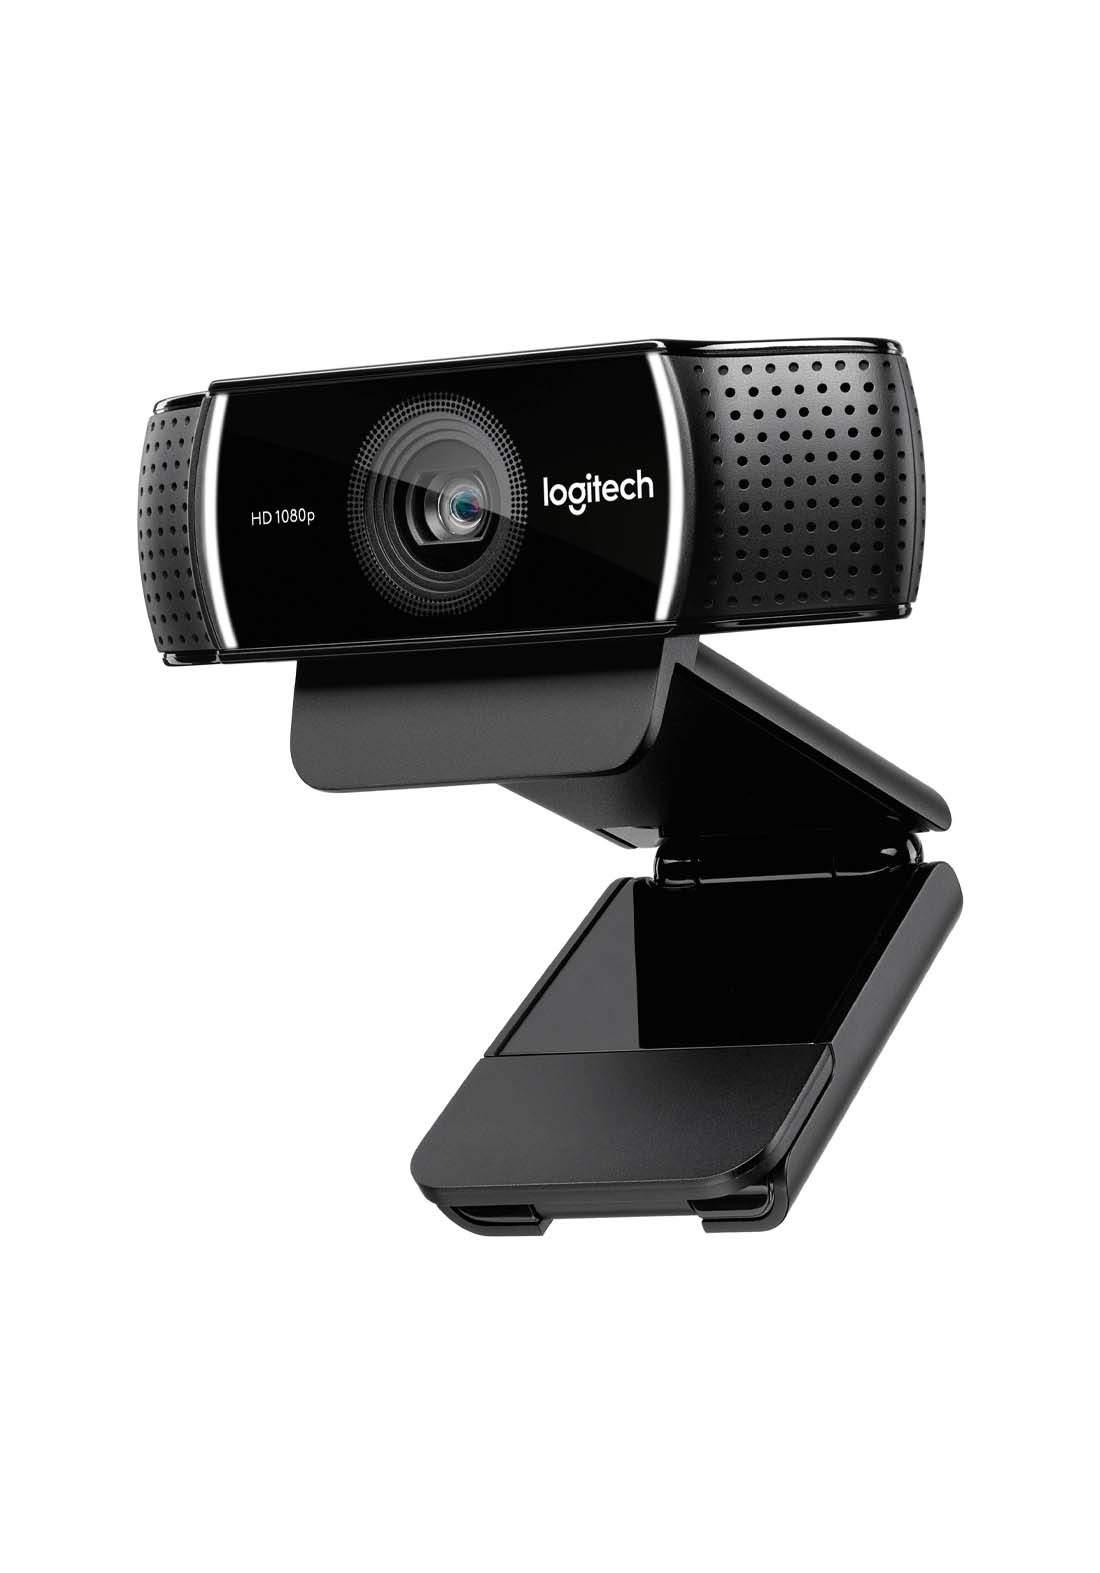 Logitech C922 Pro Stream Webcam  - Black كاميرا